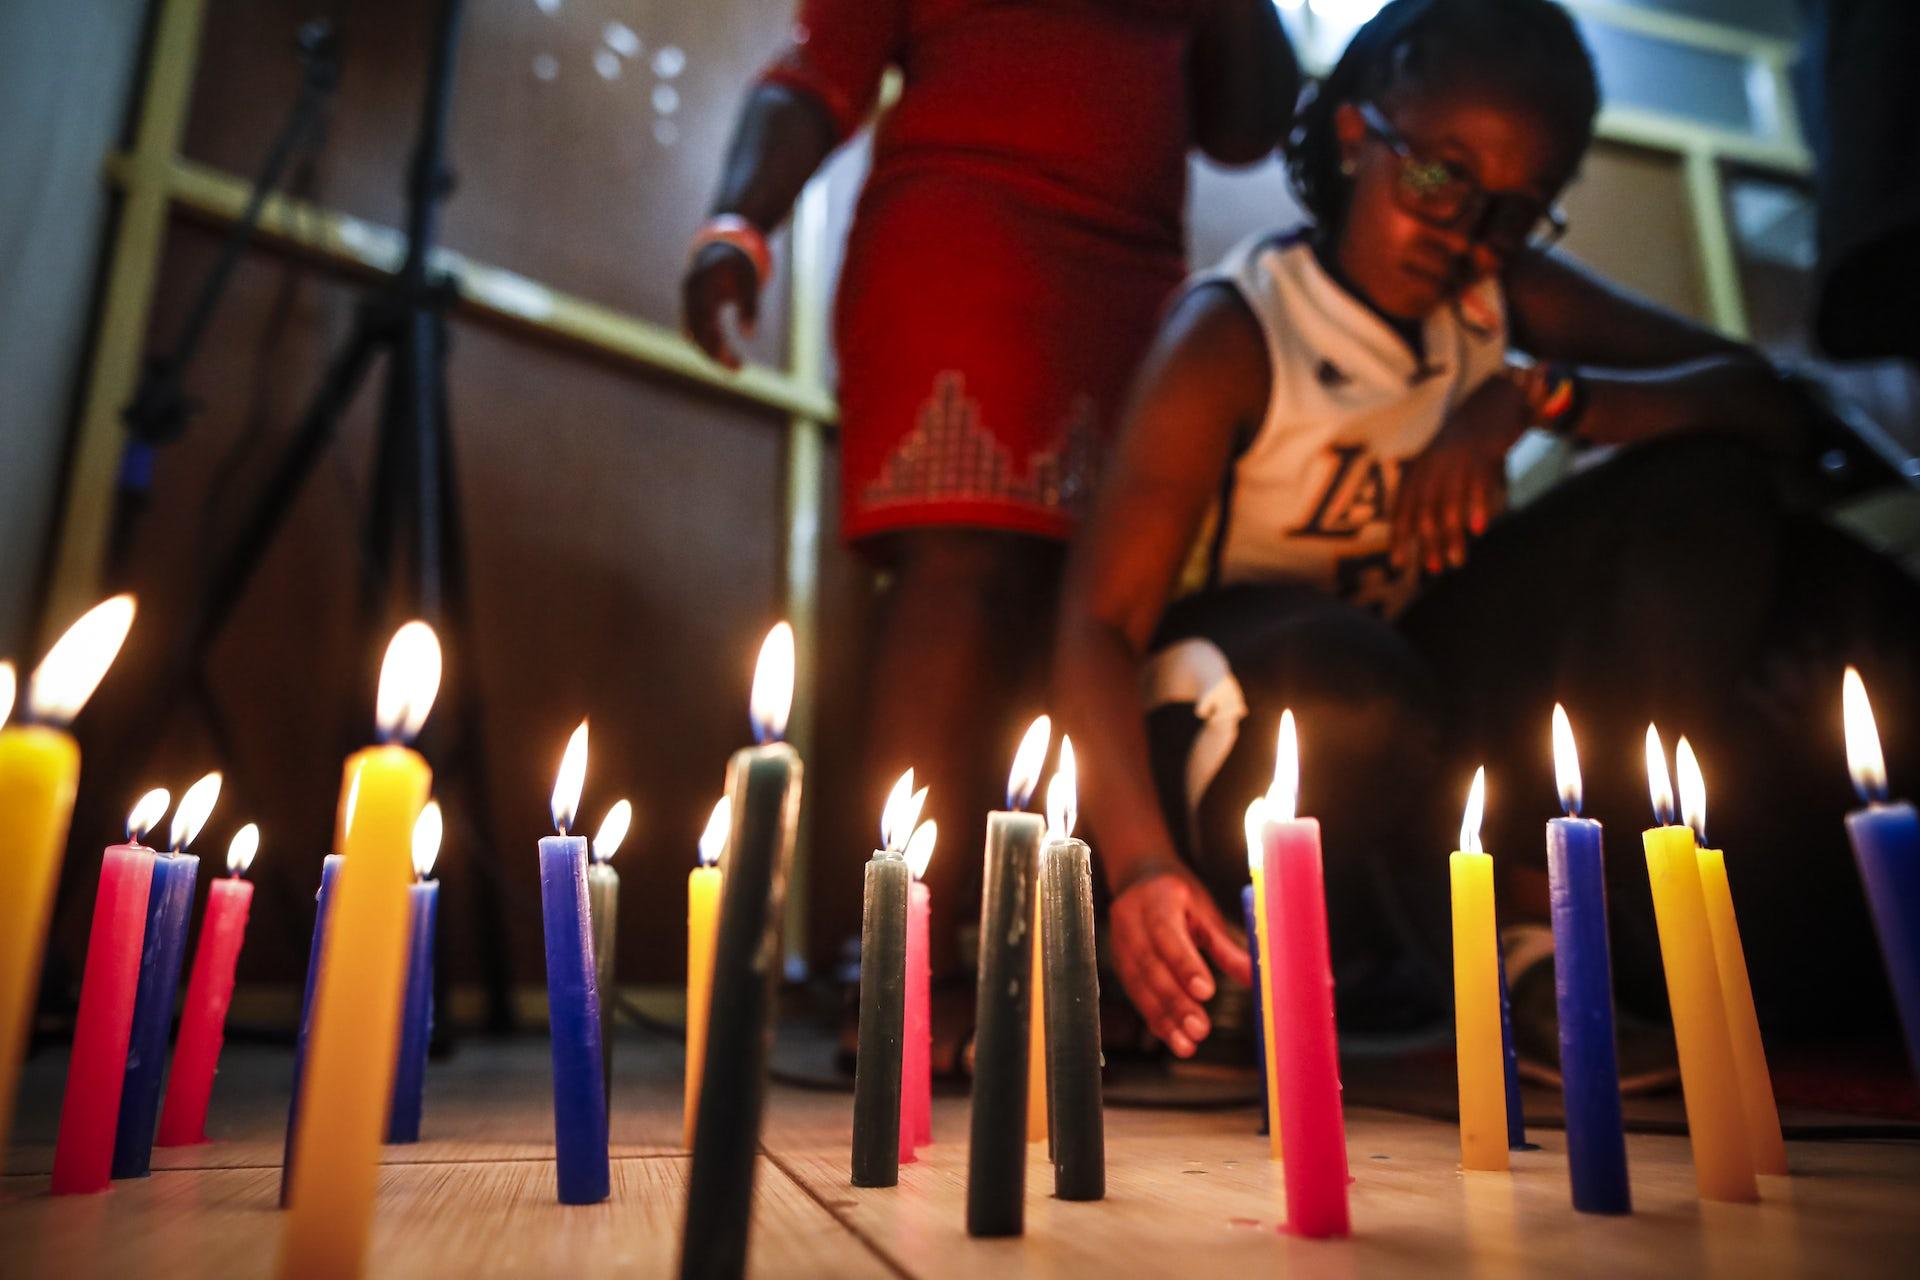 Churchgoers in Nairobi who support gay rights lit candles ahead of the  court ruling. EPA-EFE/Dai Kurokawa